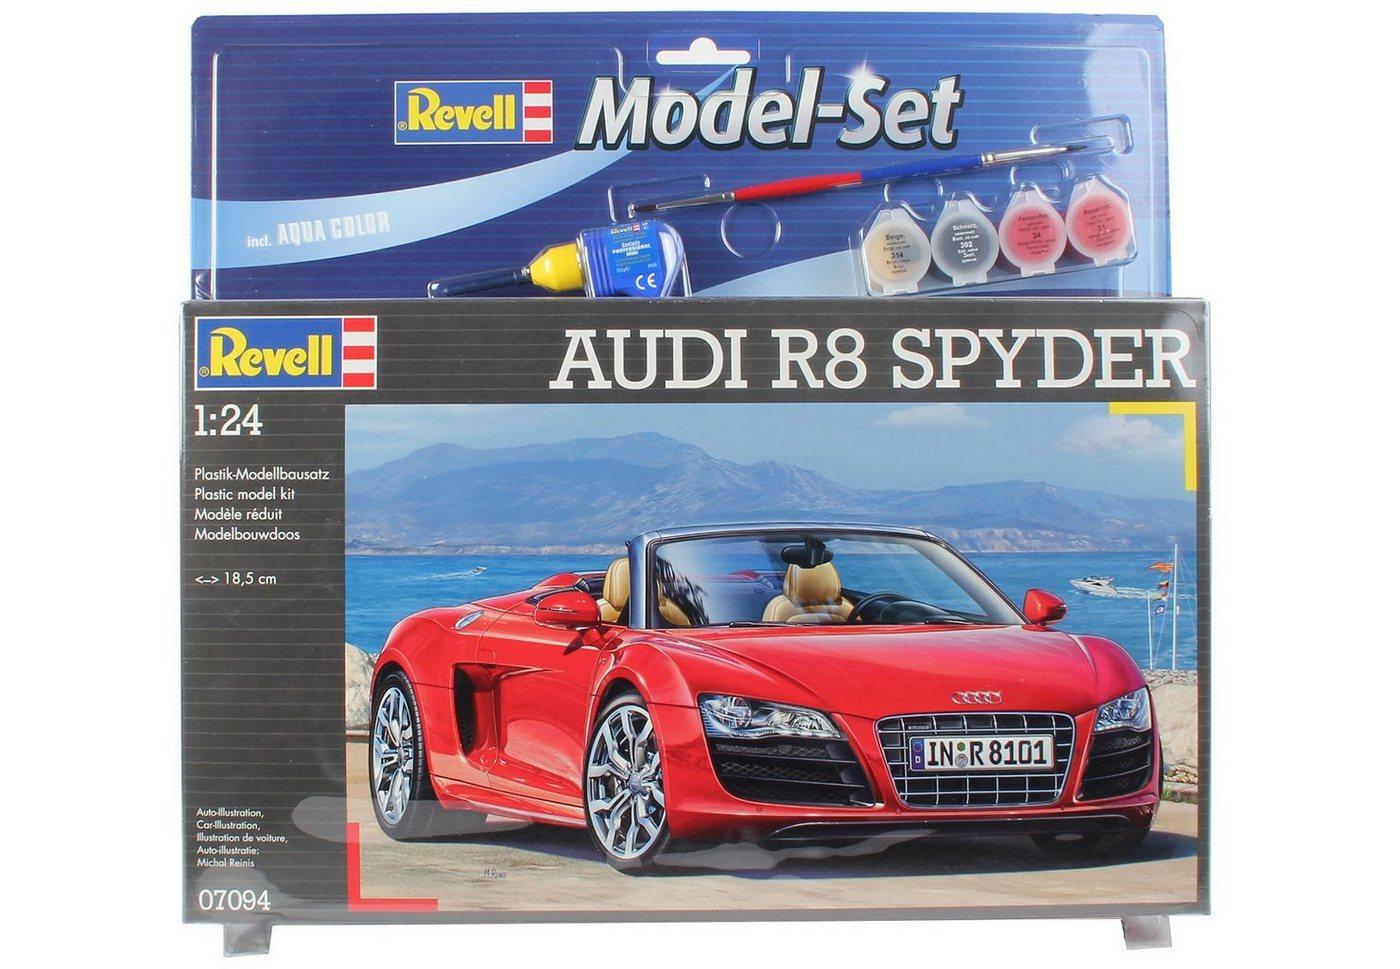 Revell® Modellbausatz Auto mit Zubehör, Maßstab 1:24, »Model Set - Audi R8 Spyder«